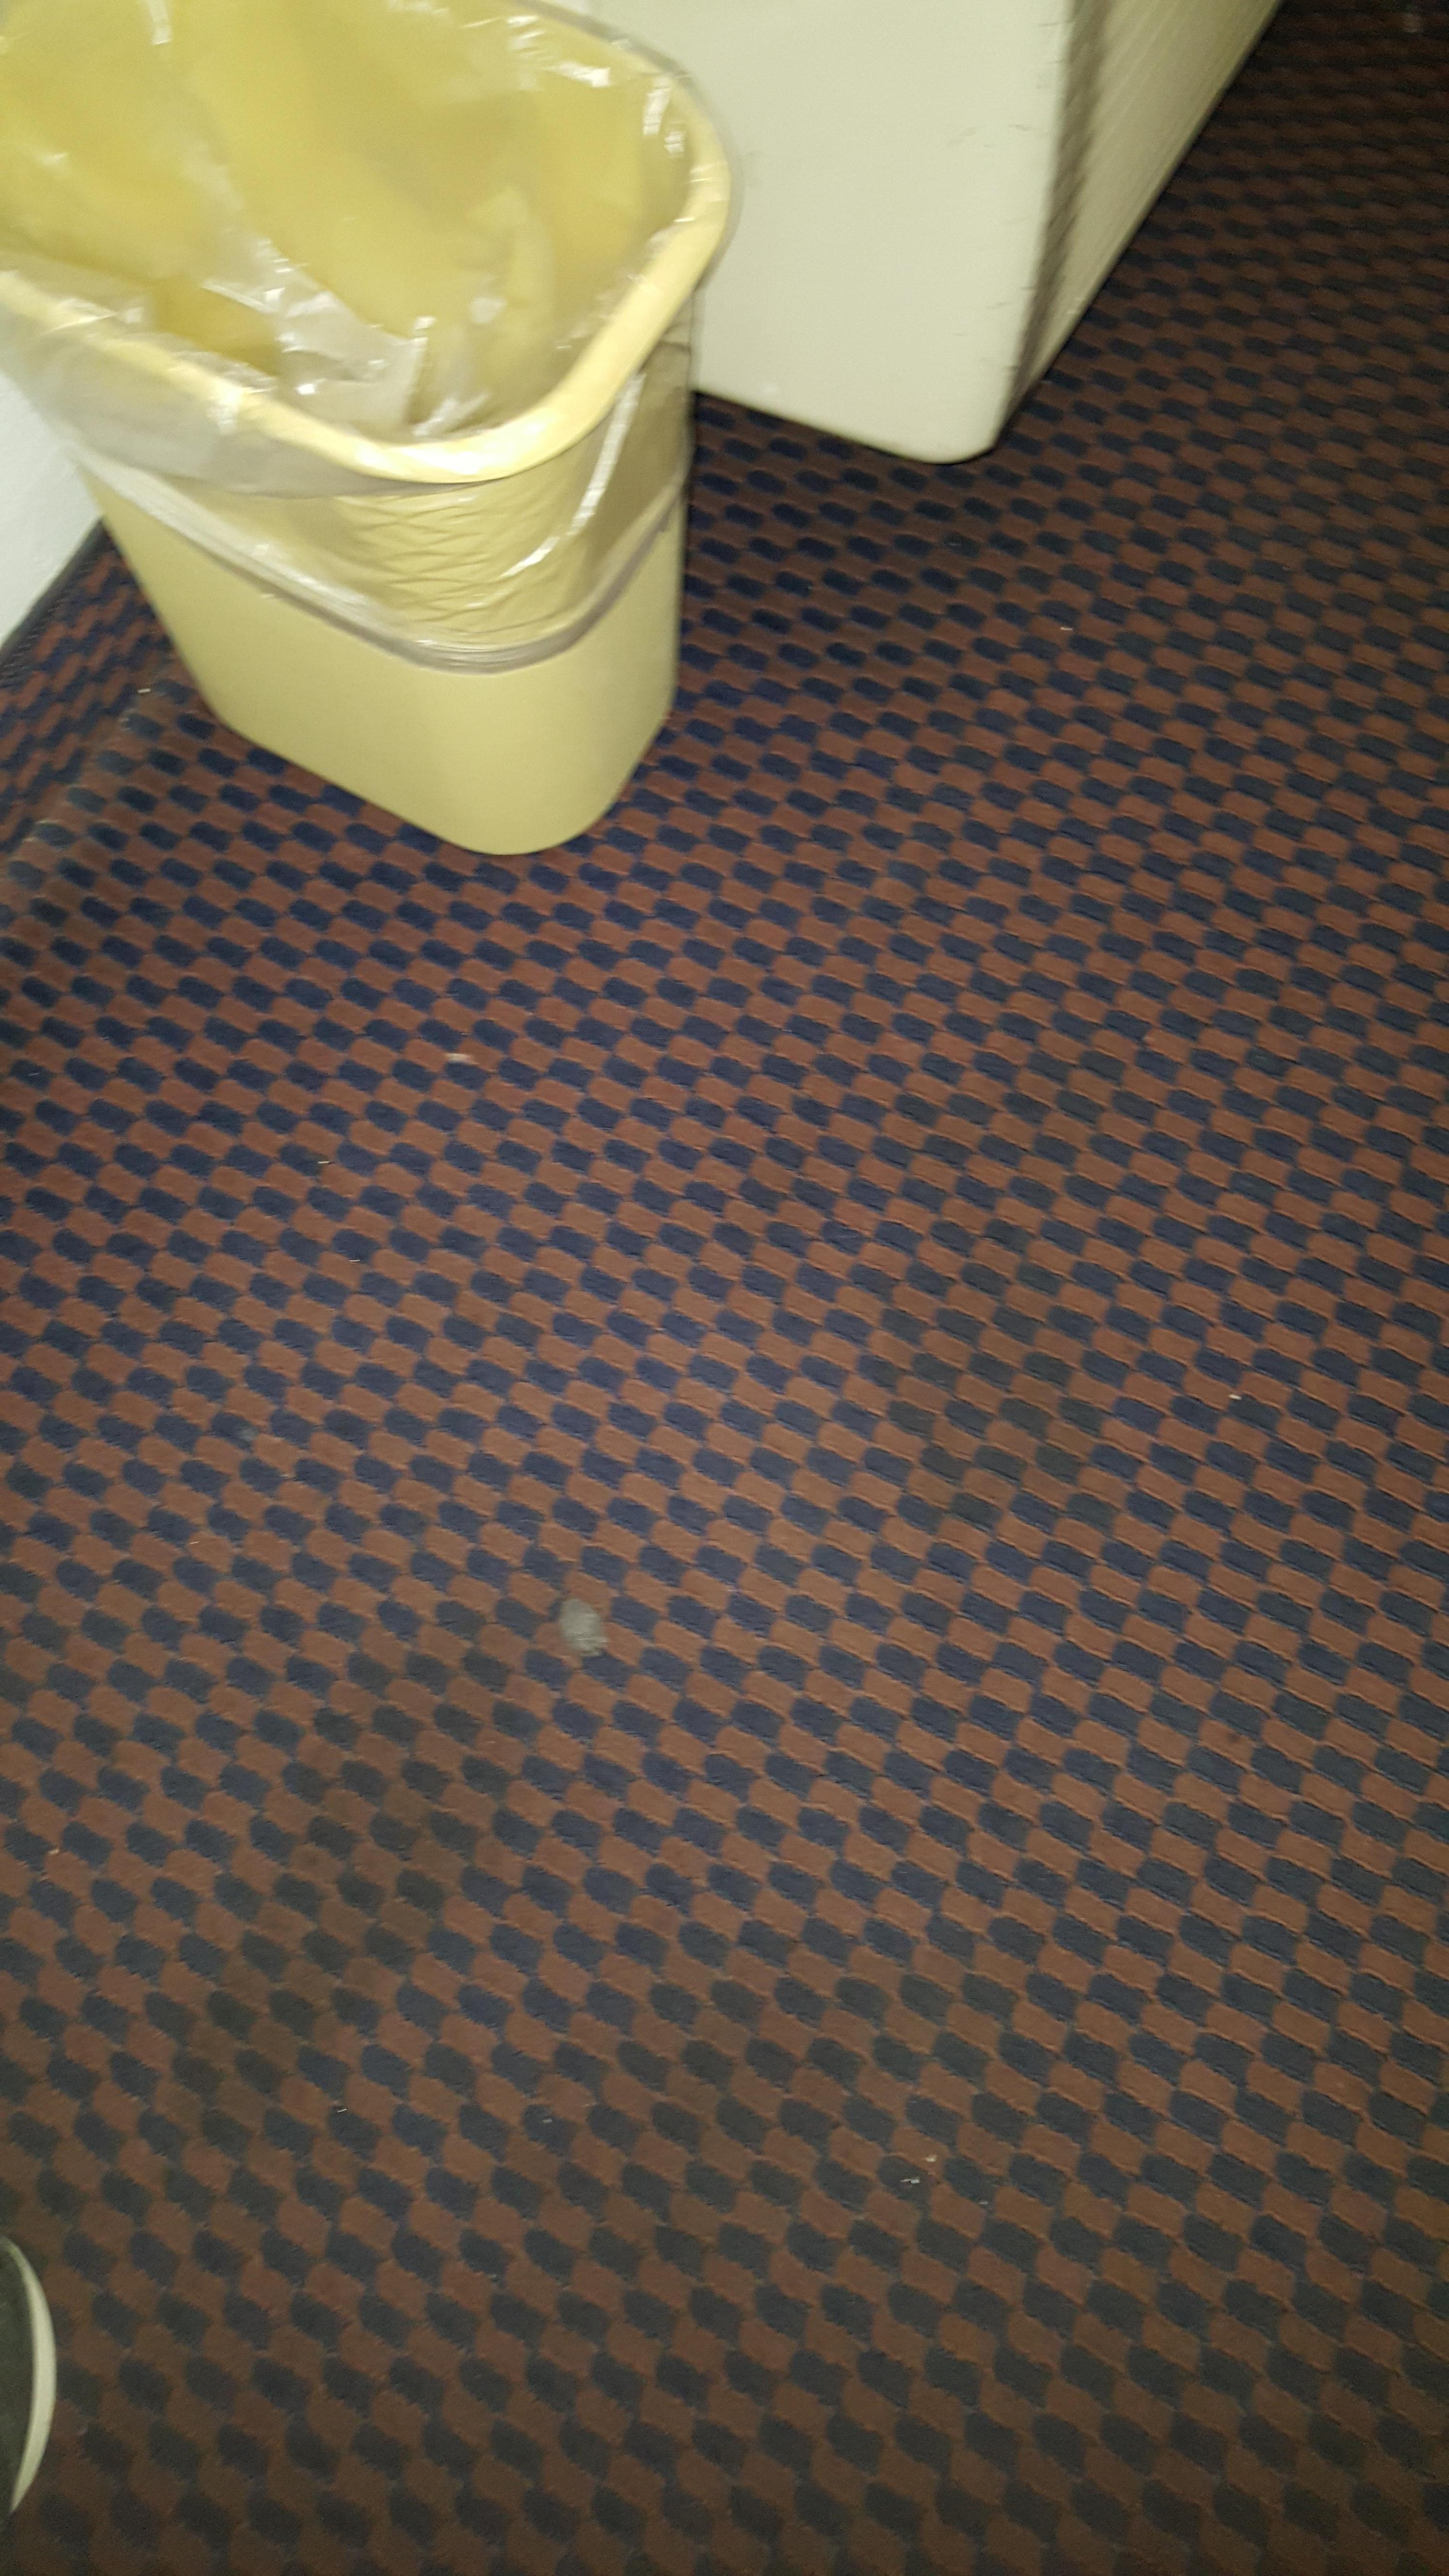 Filty carpets